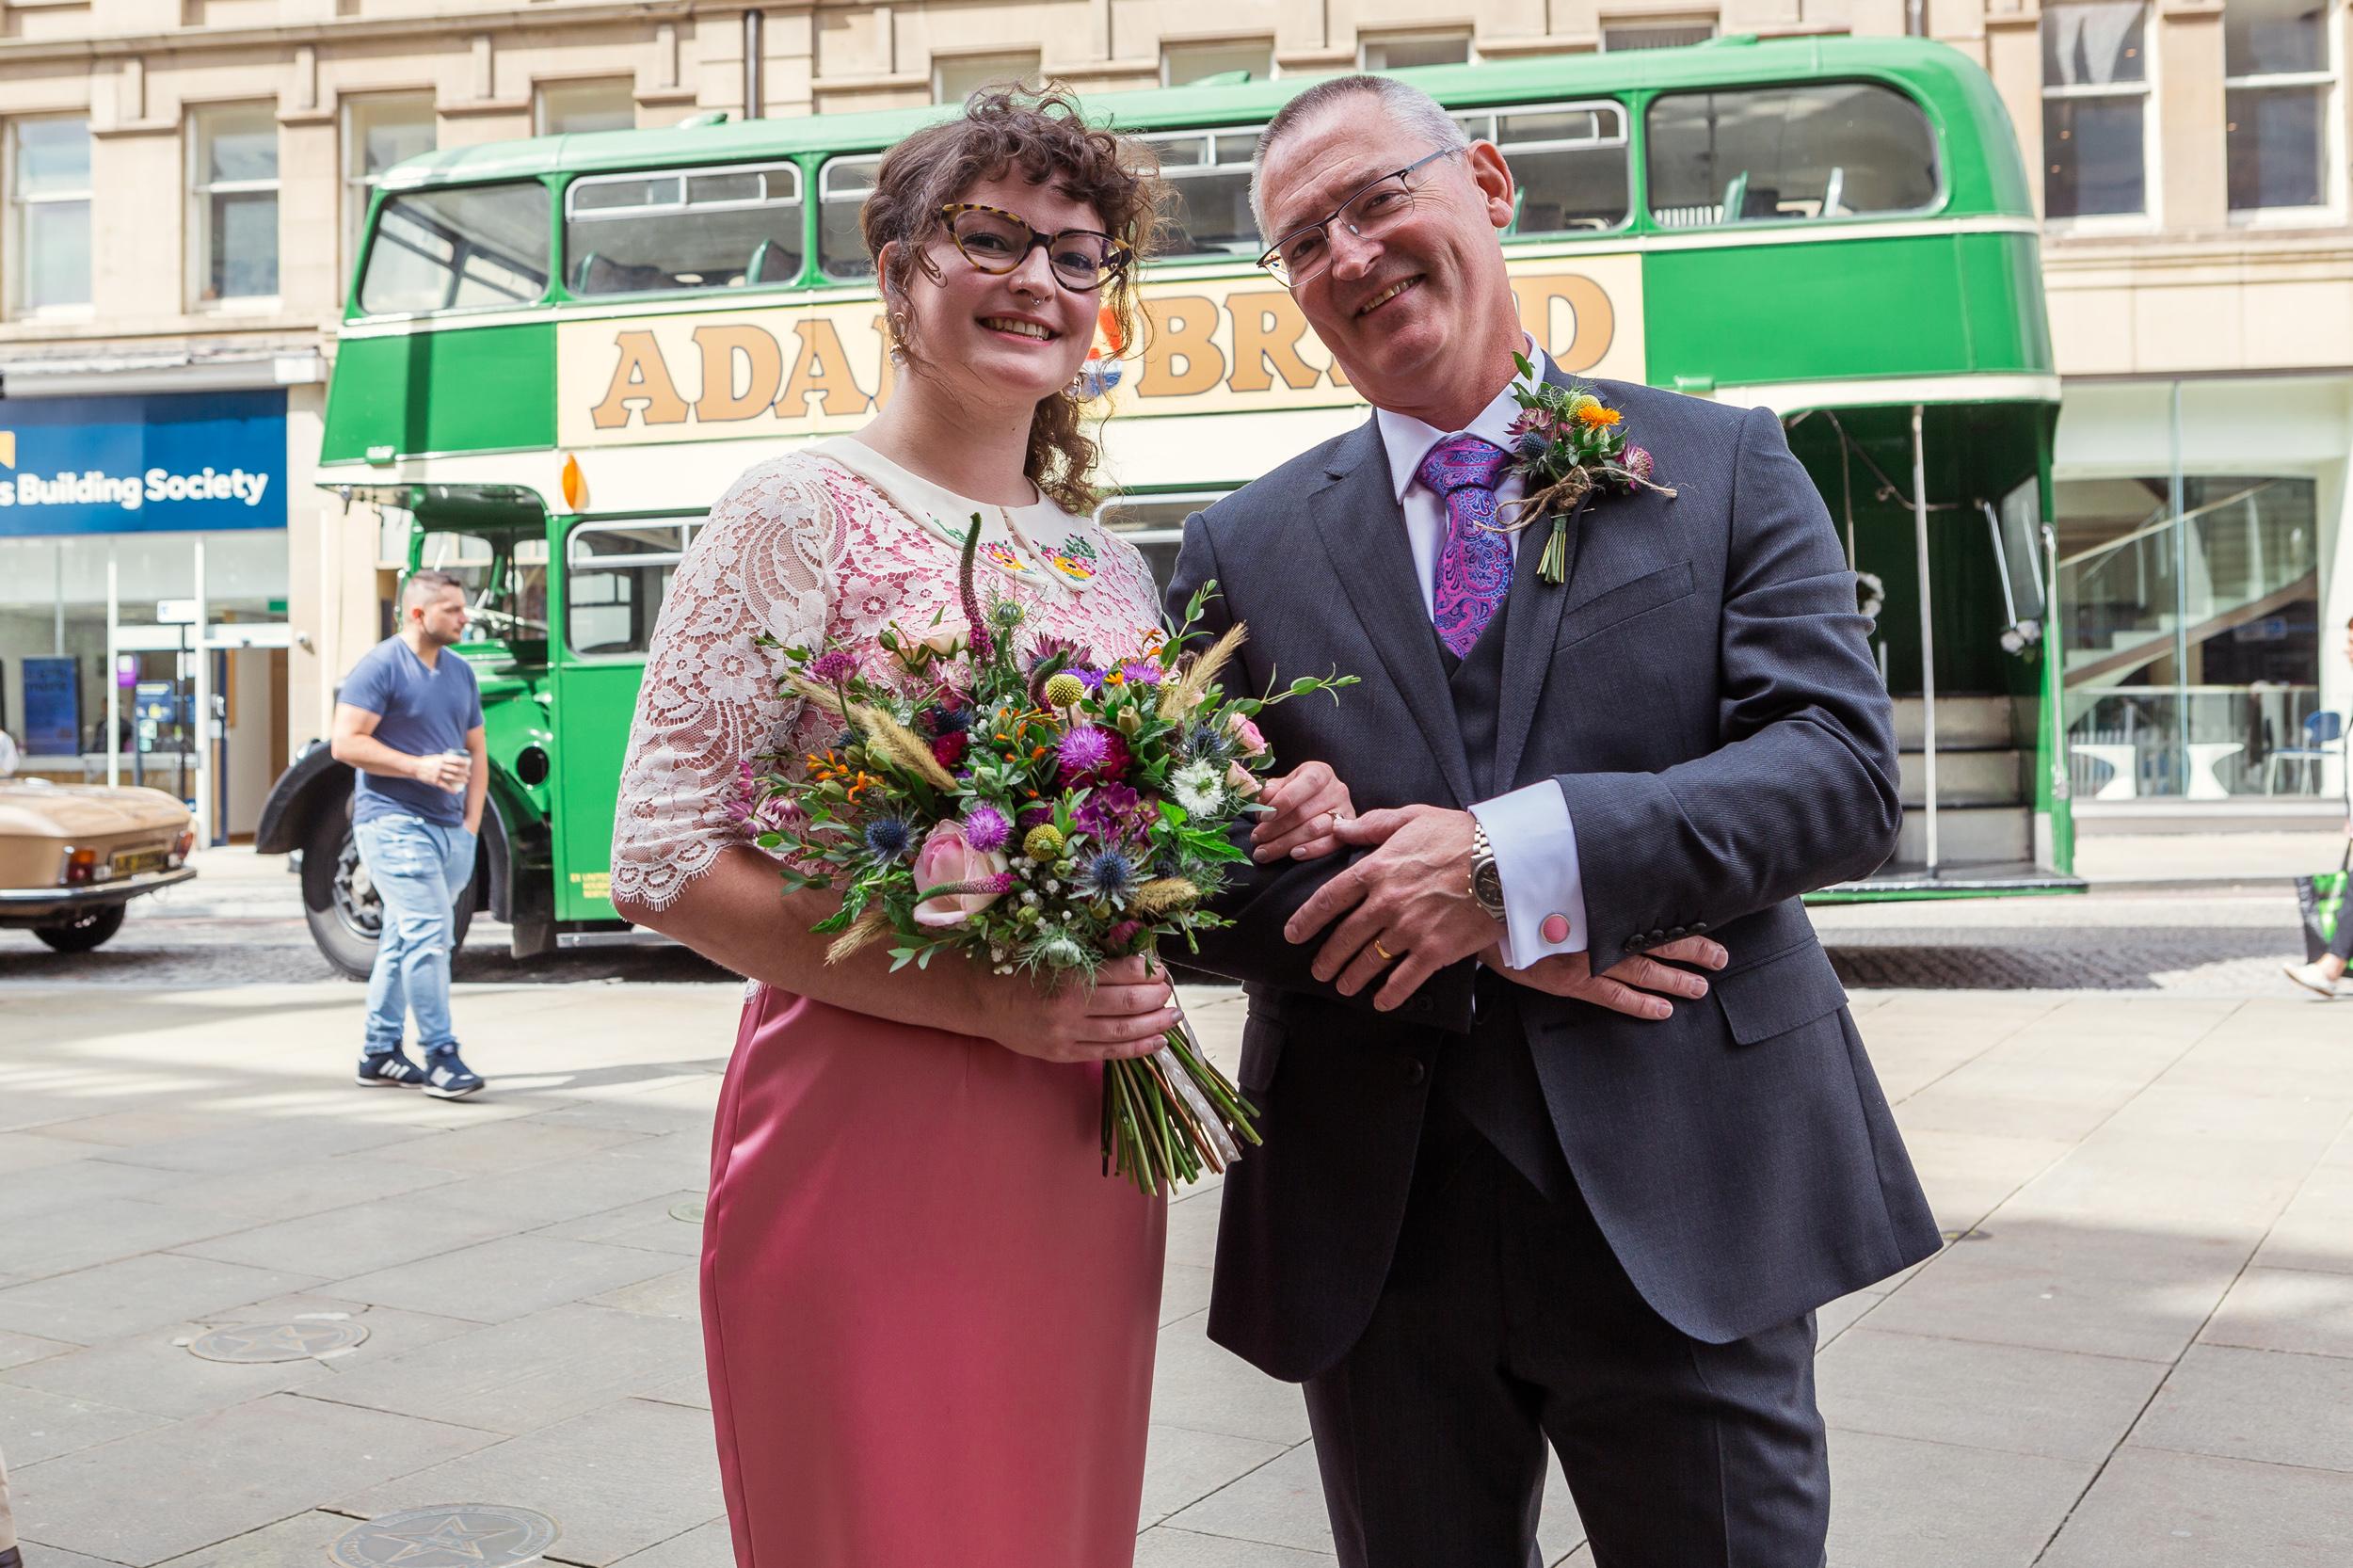 Emma-Coloured-Wedding-Dress-Sheffield-Kate-Beaumont-2.jpg